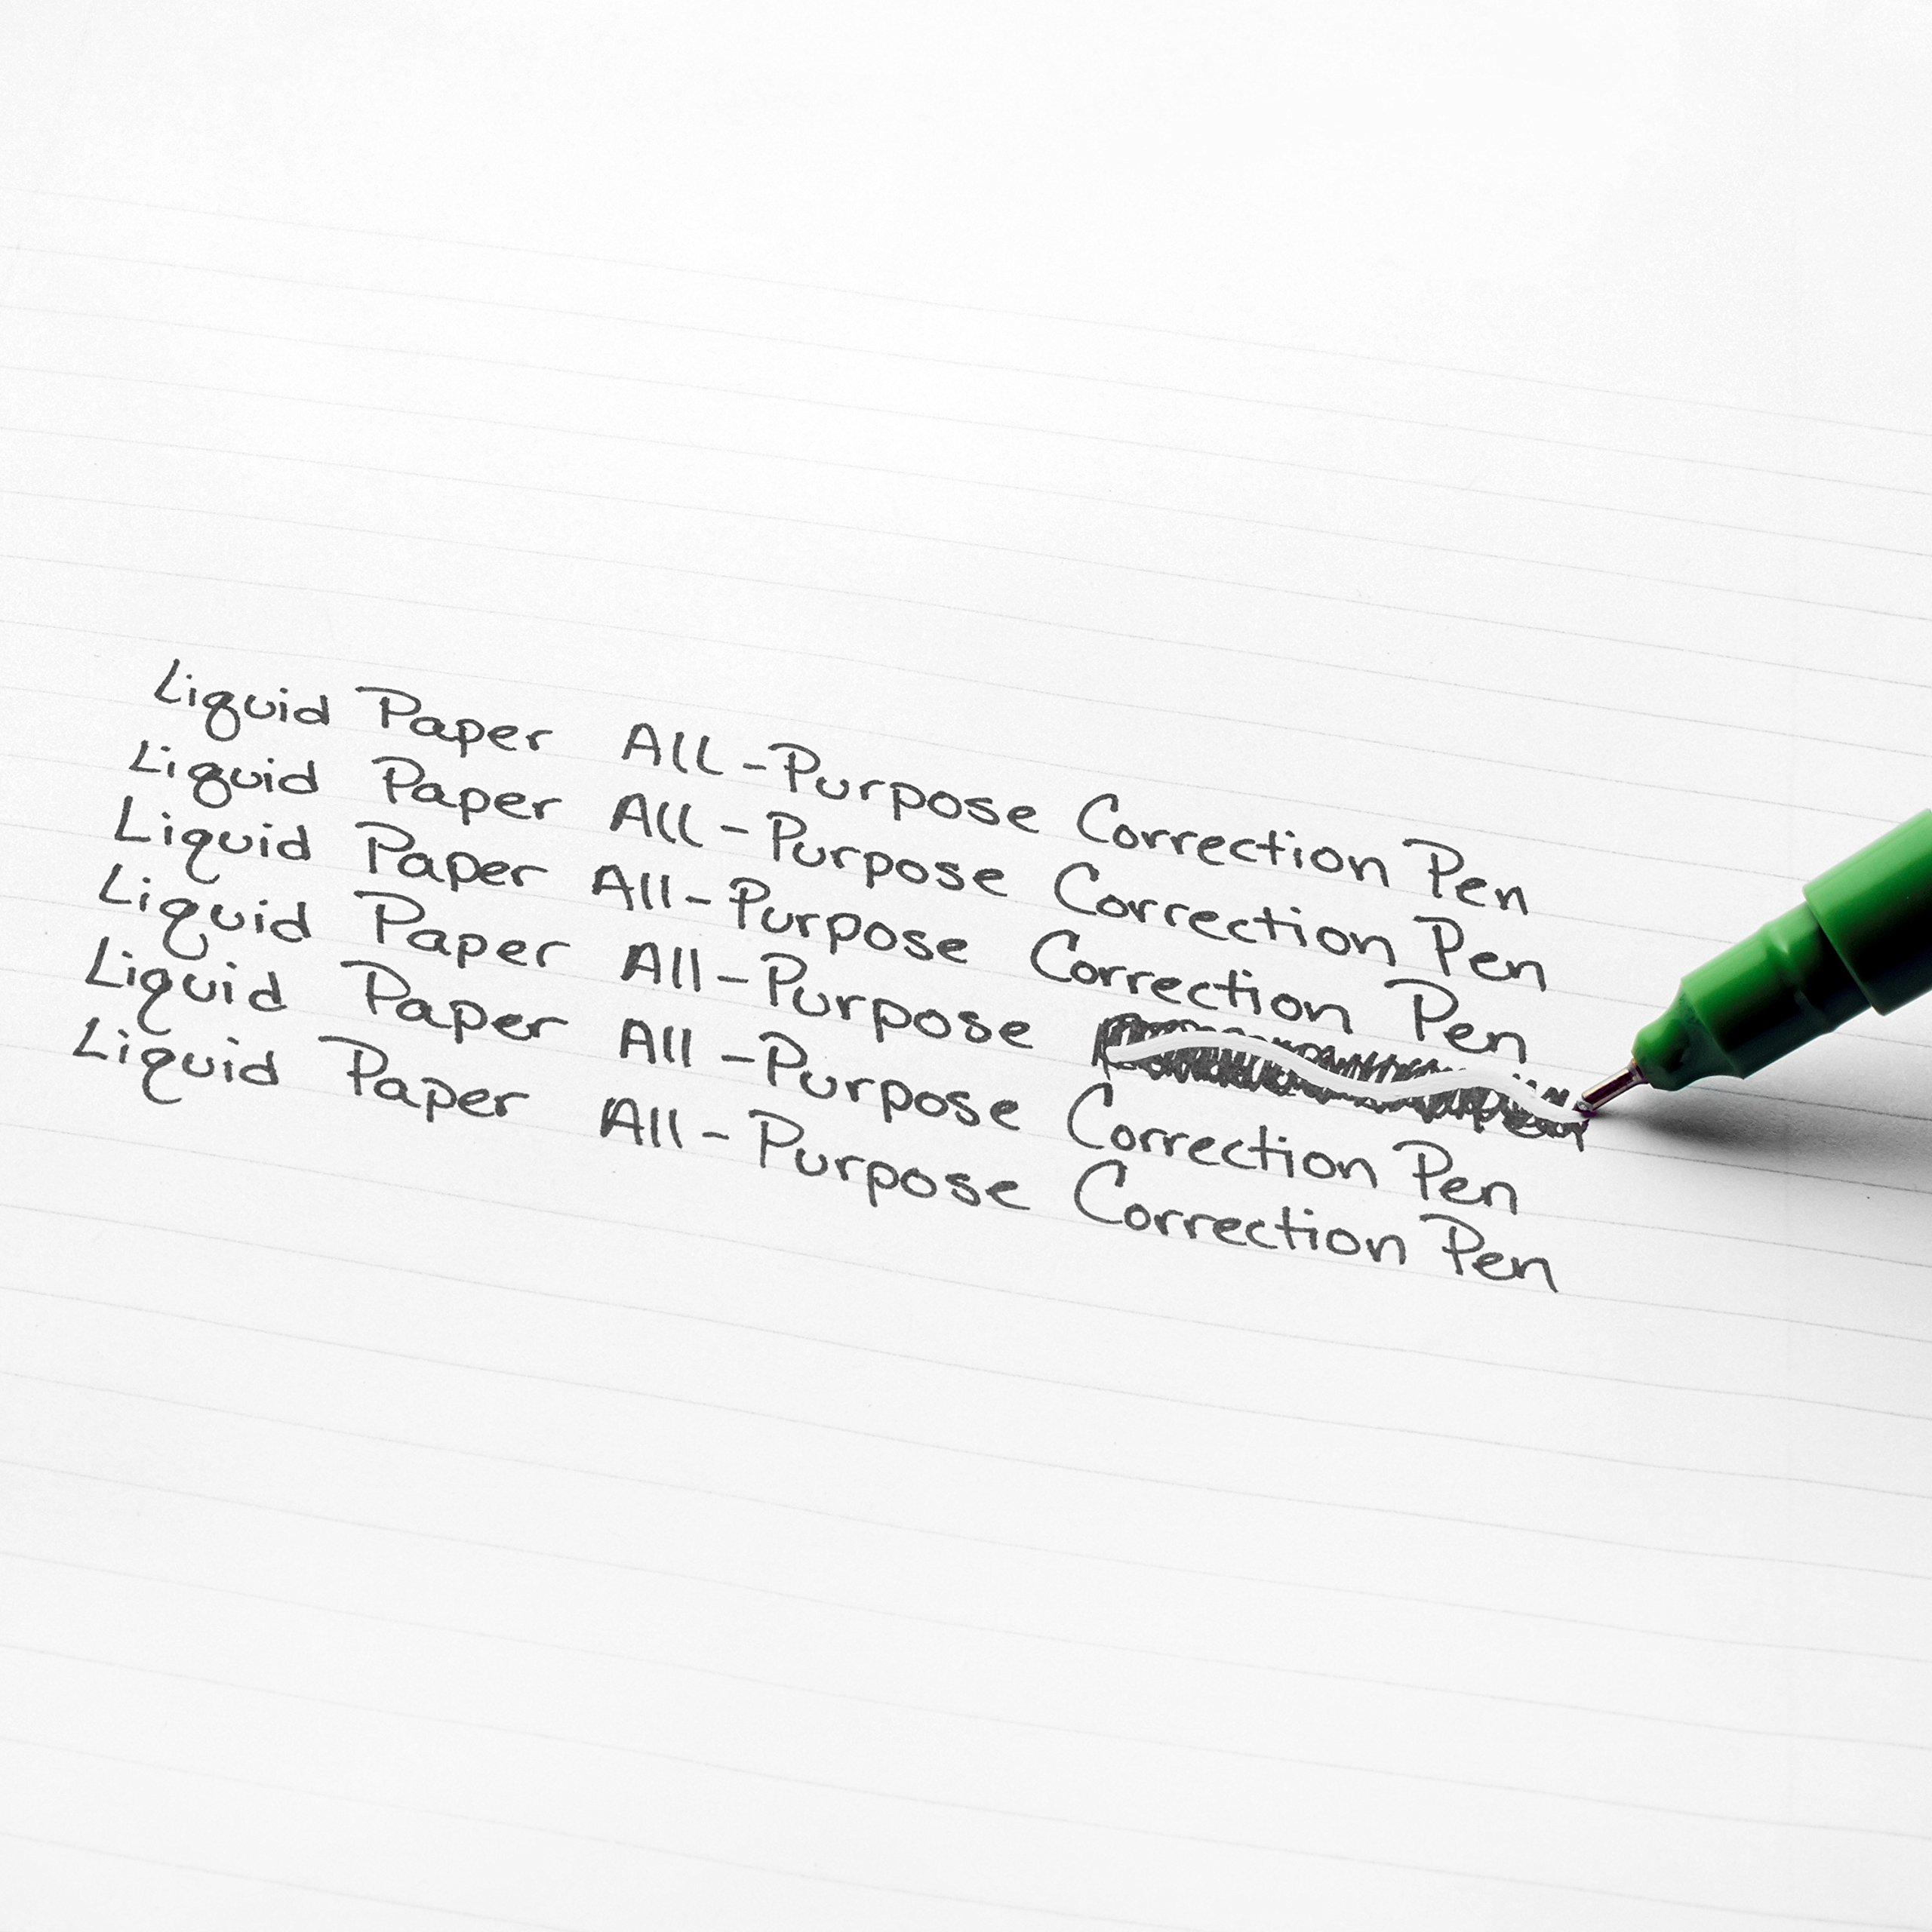 Paper Mate Liquid Paper Correction Pen, 7 ml, 2 Count by Liquid Paper (Image #3)